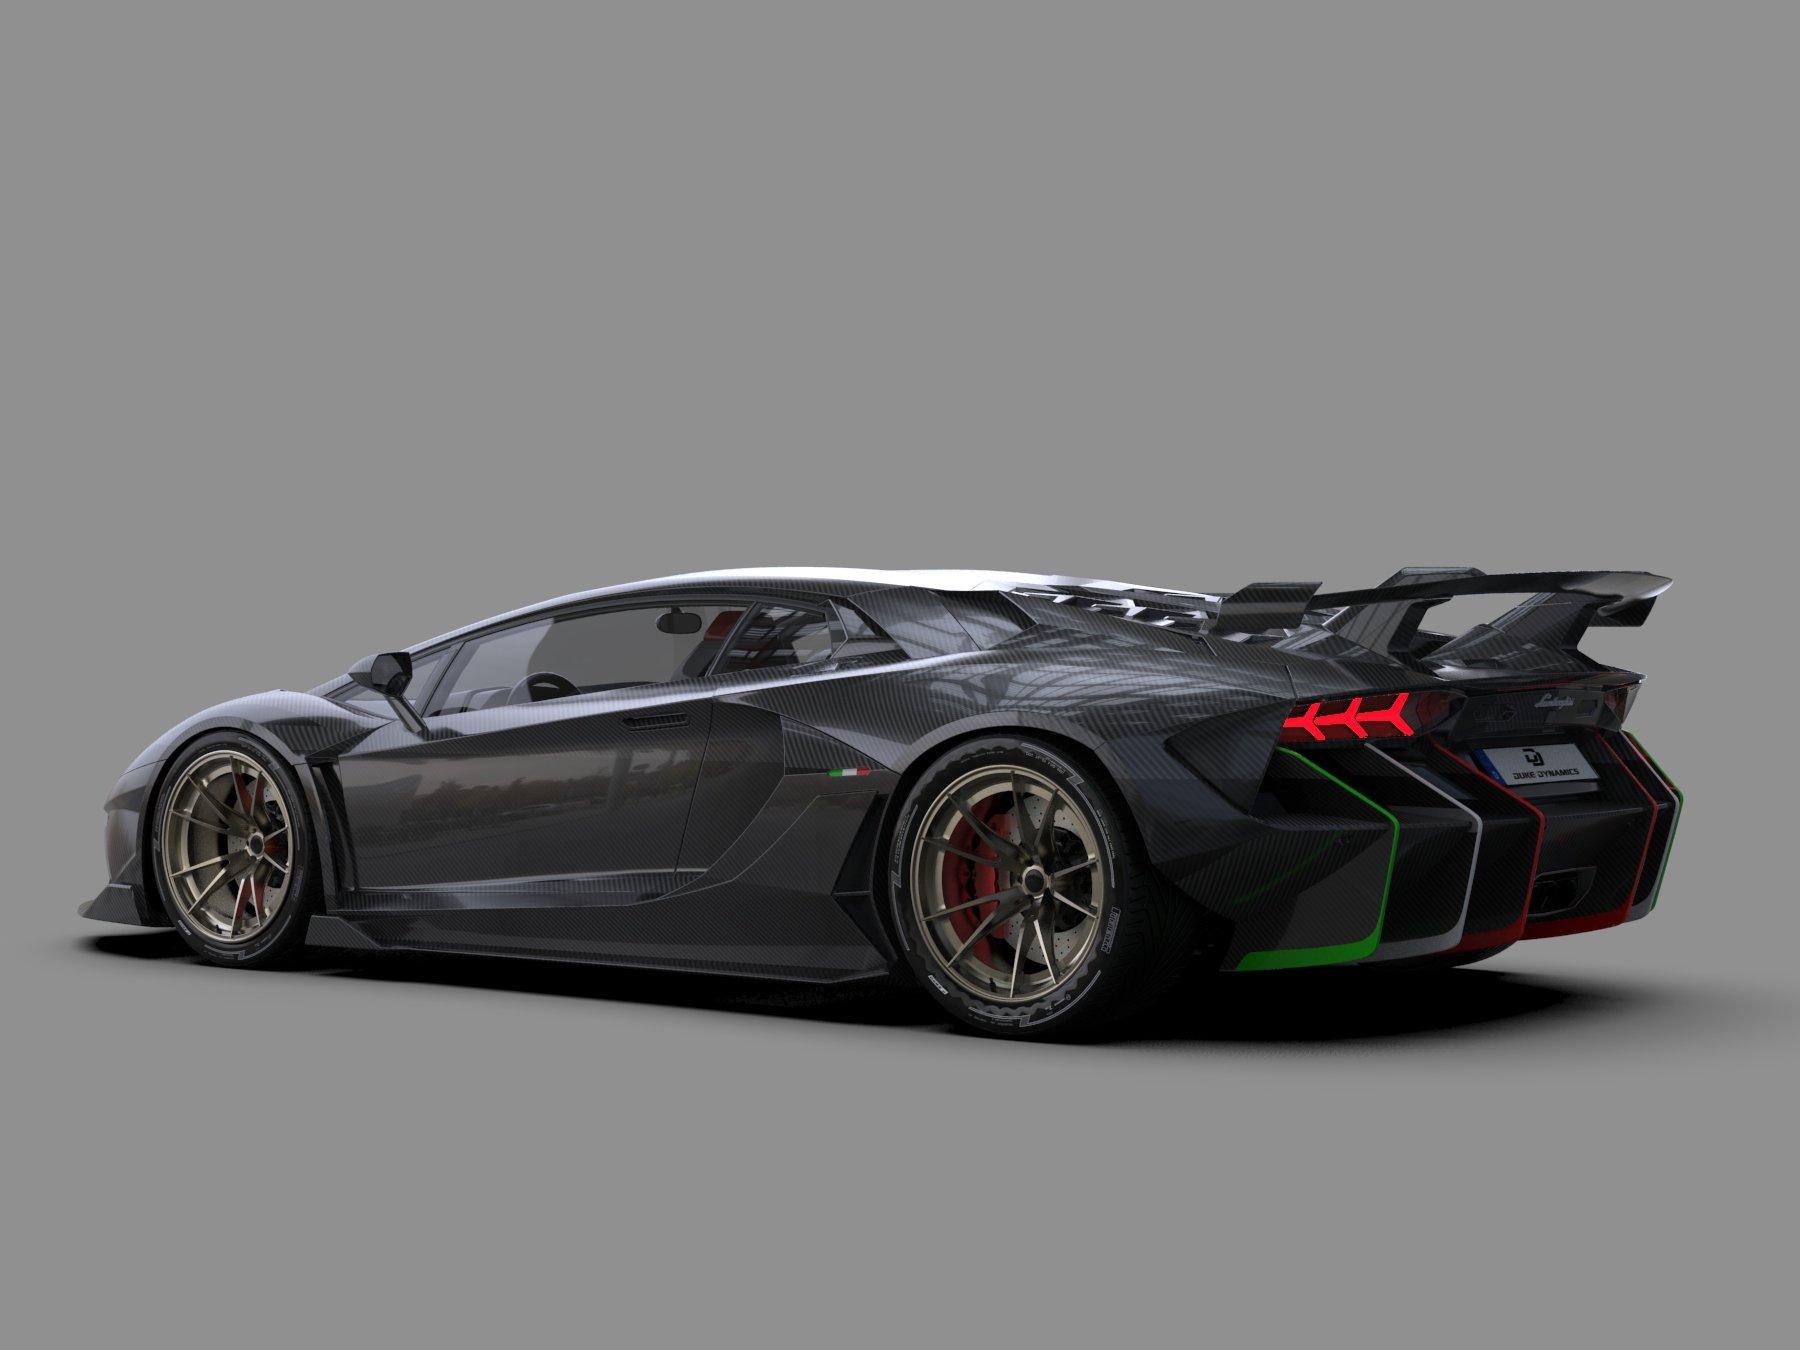 Lamborghini_Aventador_by_Duke_Dynamics_0006